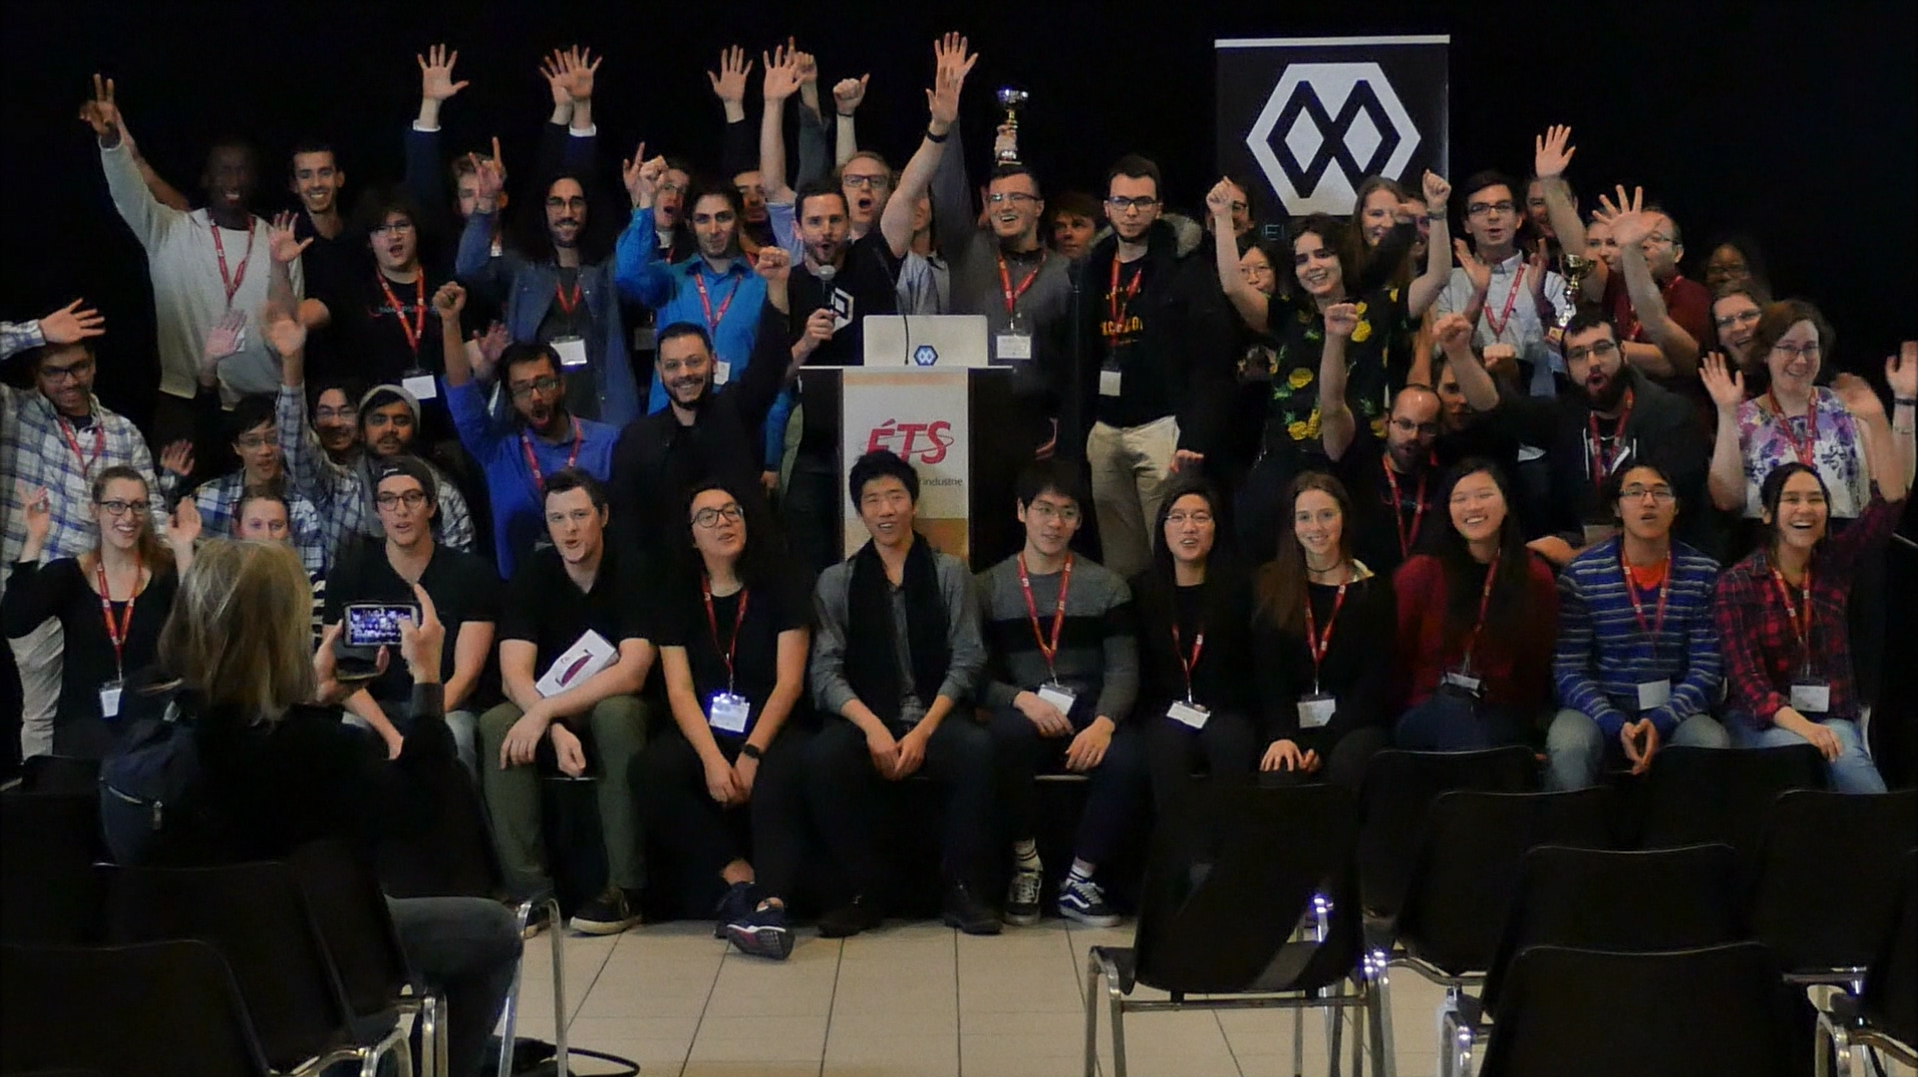 NeuroTechX Student Clubs - 2016 Edition